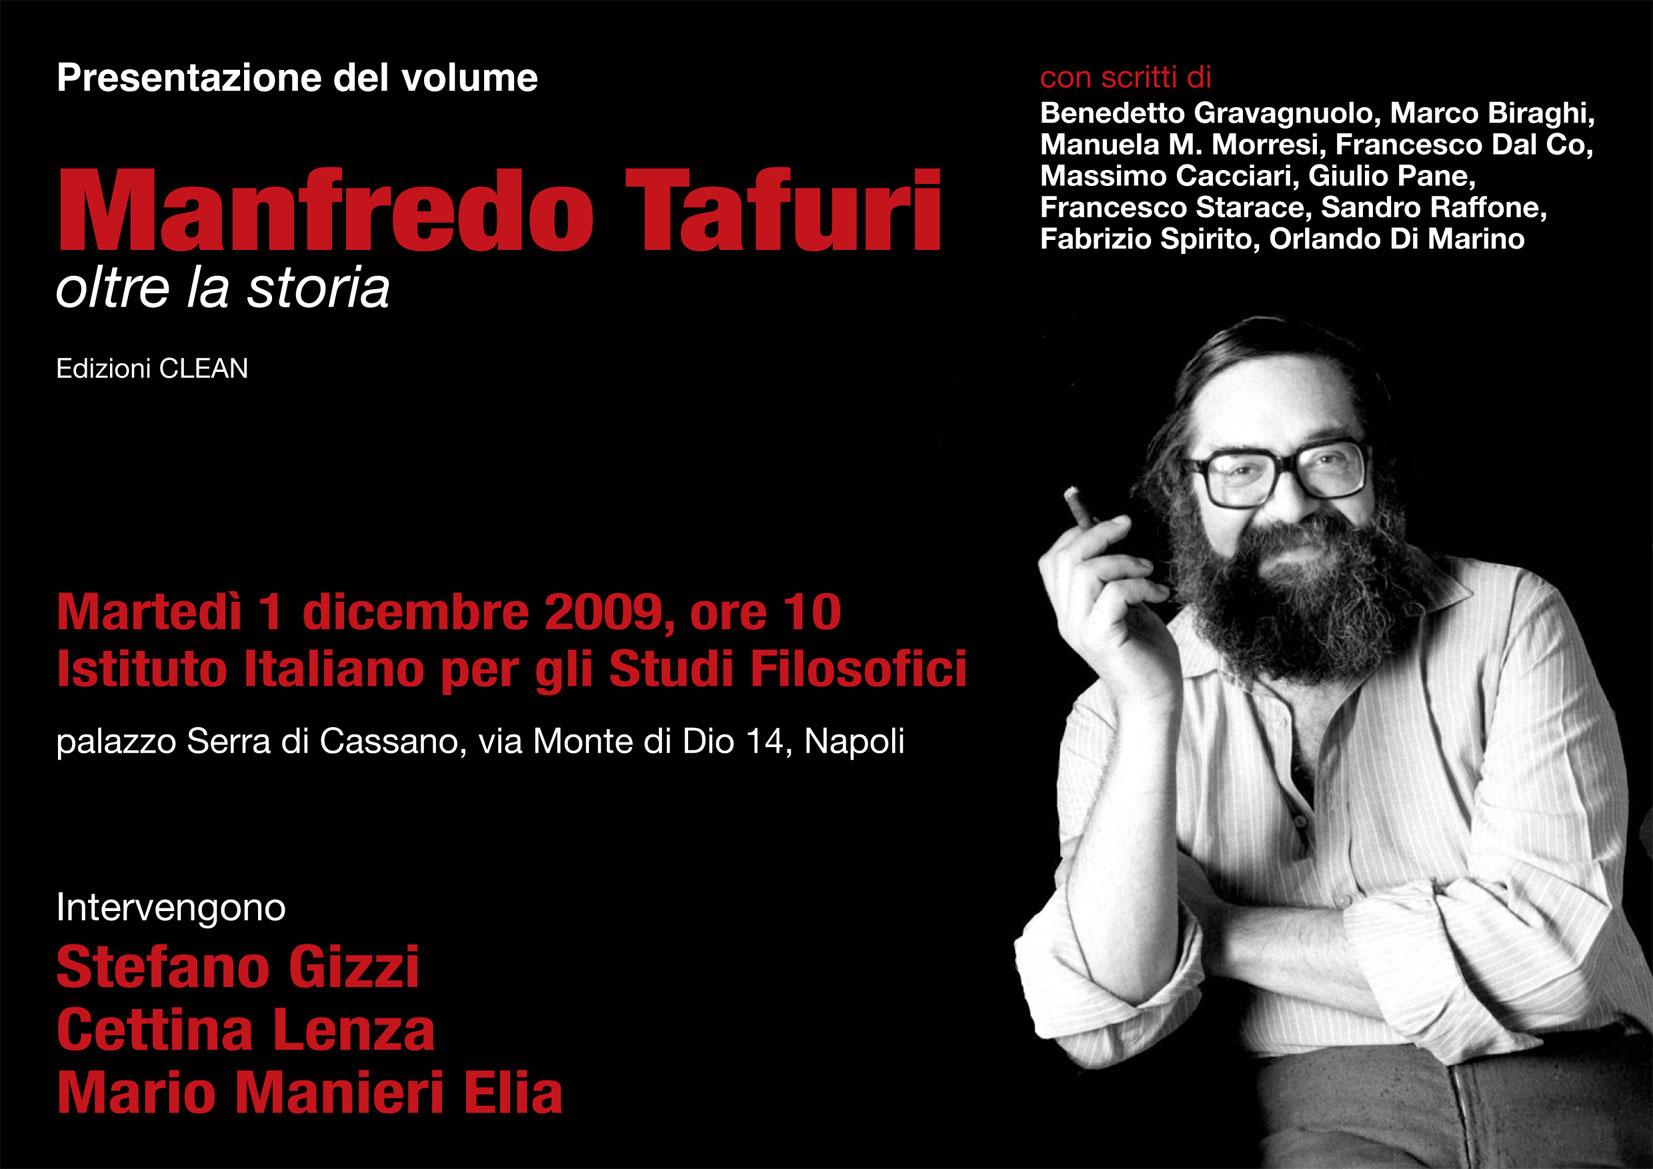 Manfredo Tafuri oltre la storia